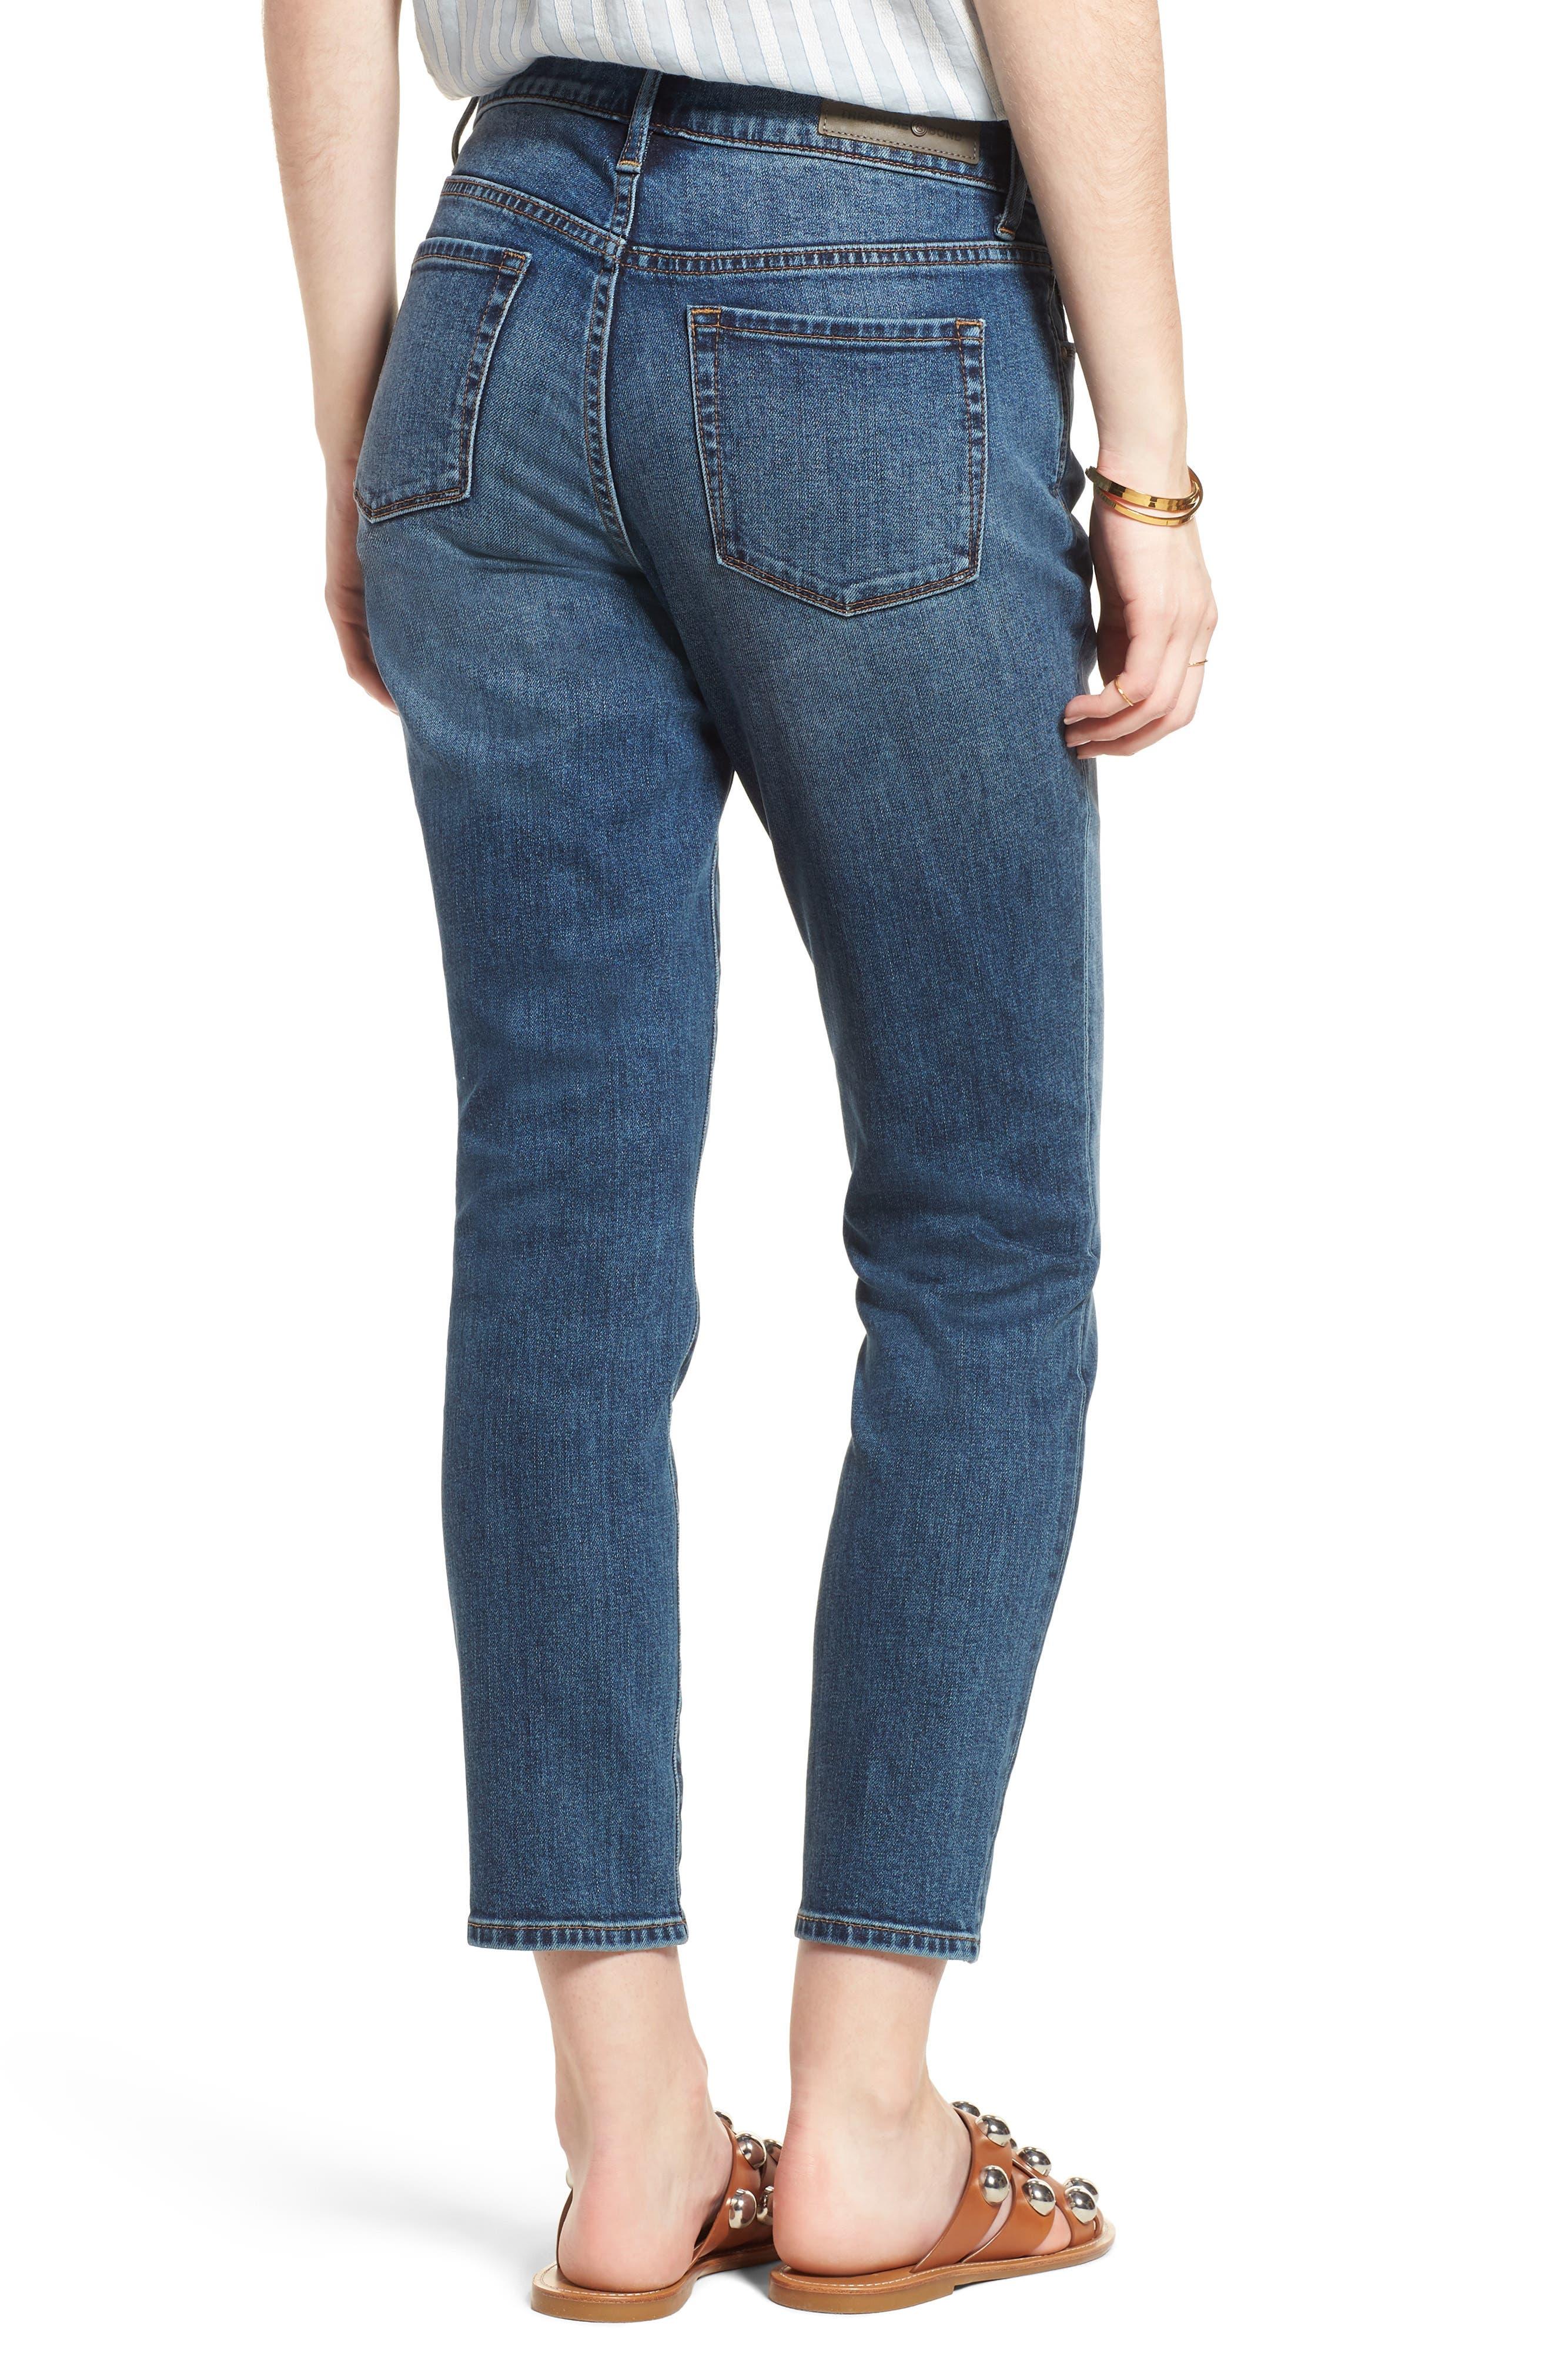 Alternate Image 2  - Treasure & Bond Grant Ankle Boyfriend Jeans (Gravel Dusk Vintage)